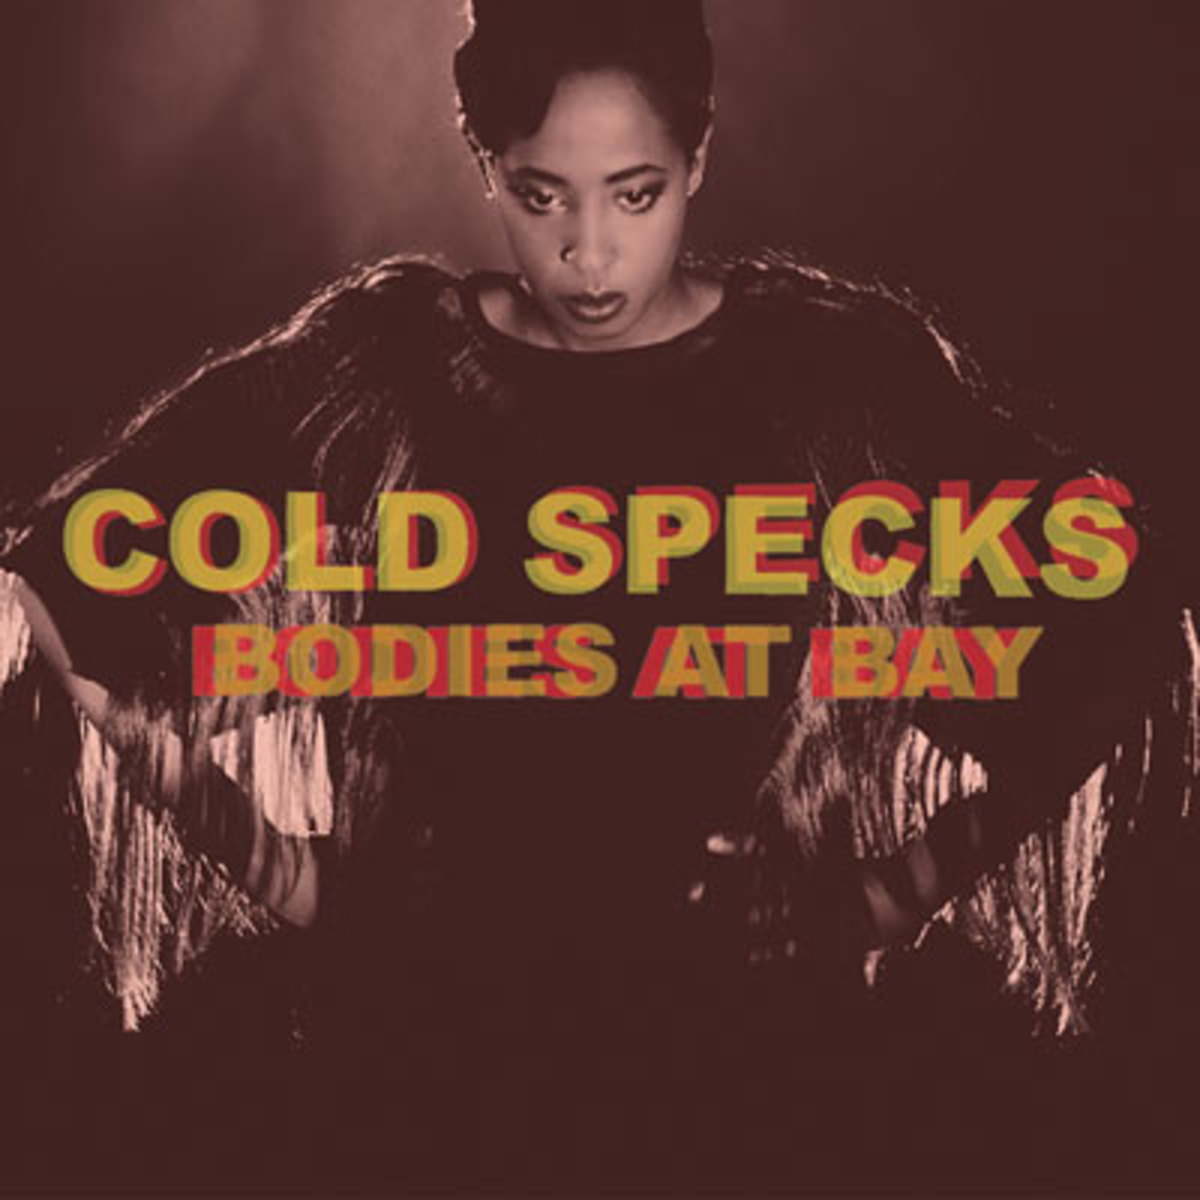 coldspecks-bodiesatbay.jpg